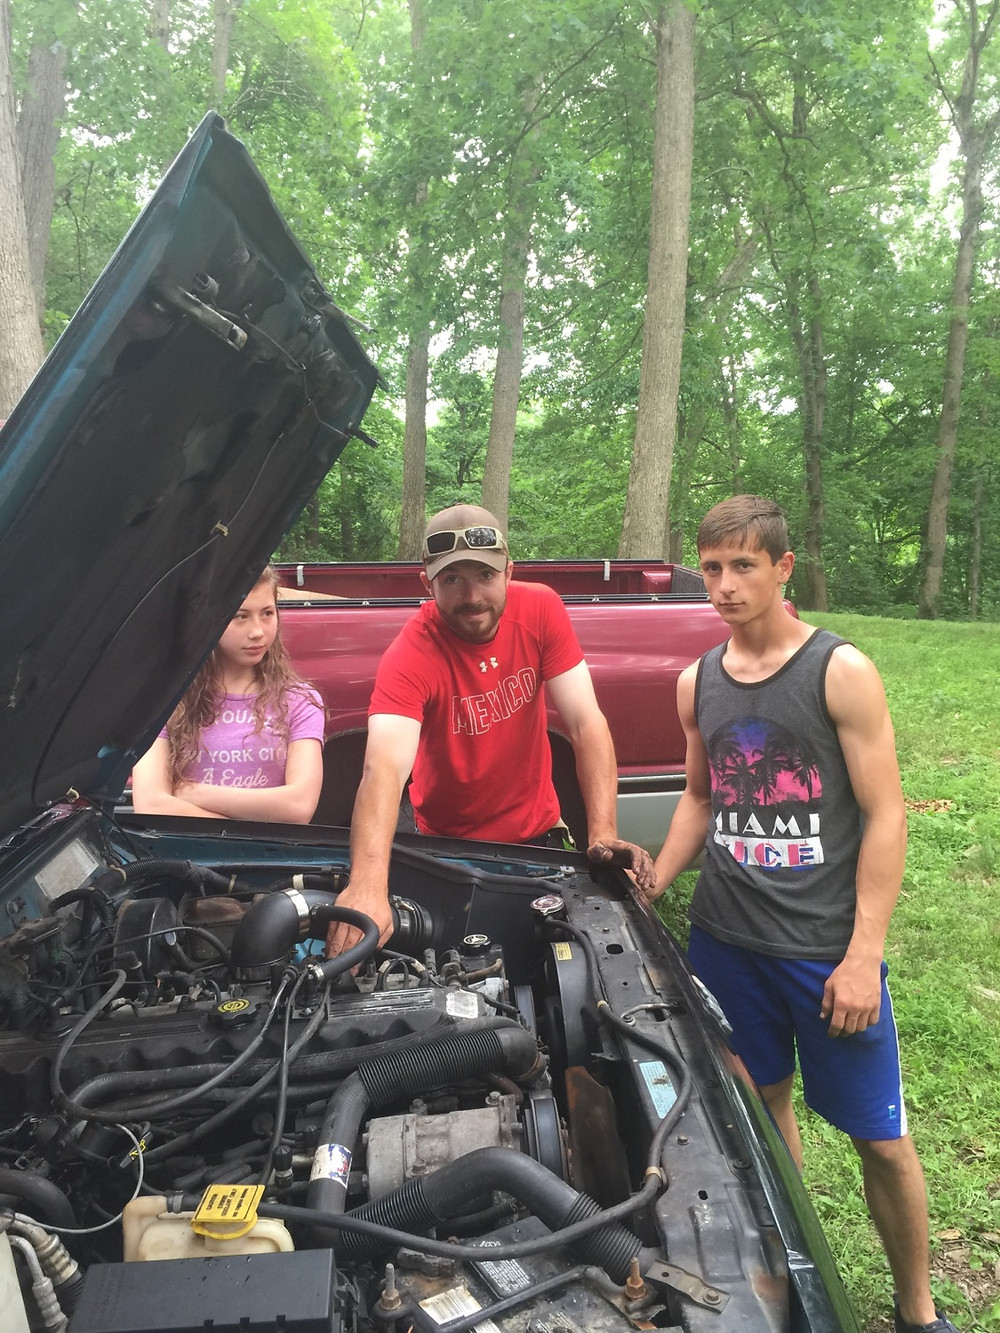 Teen boys working on their cars